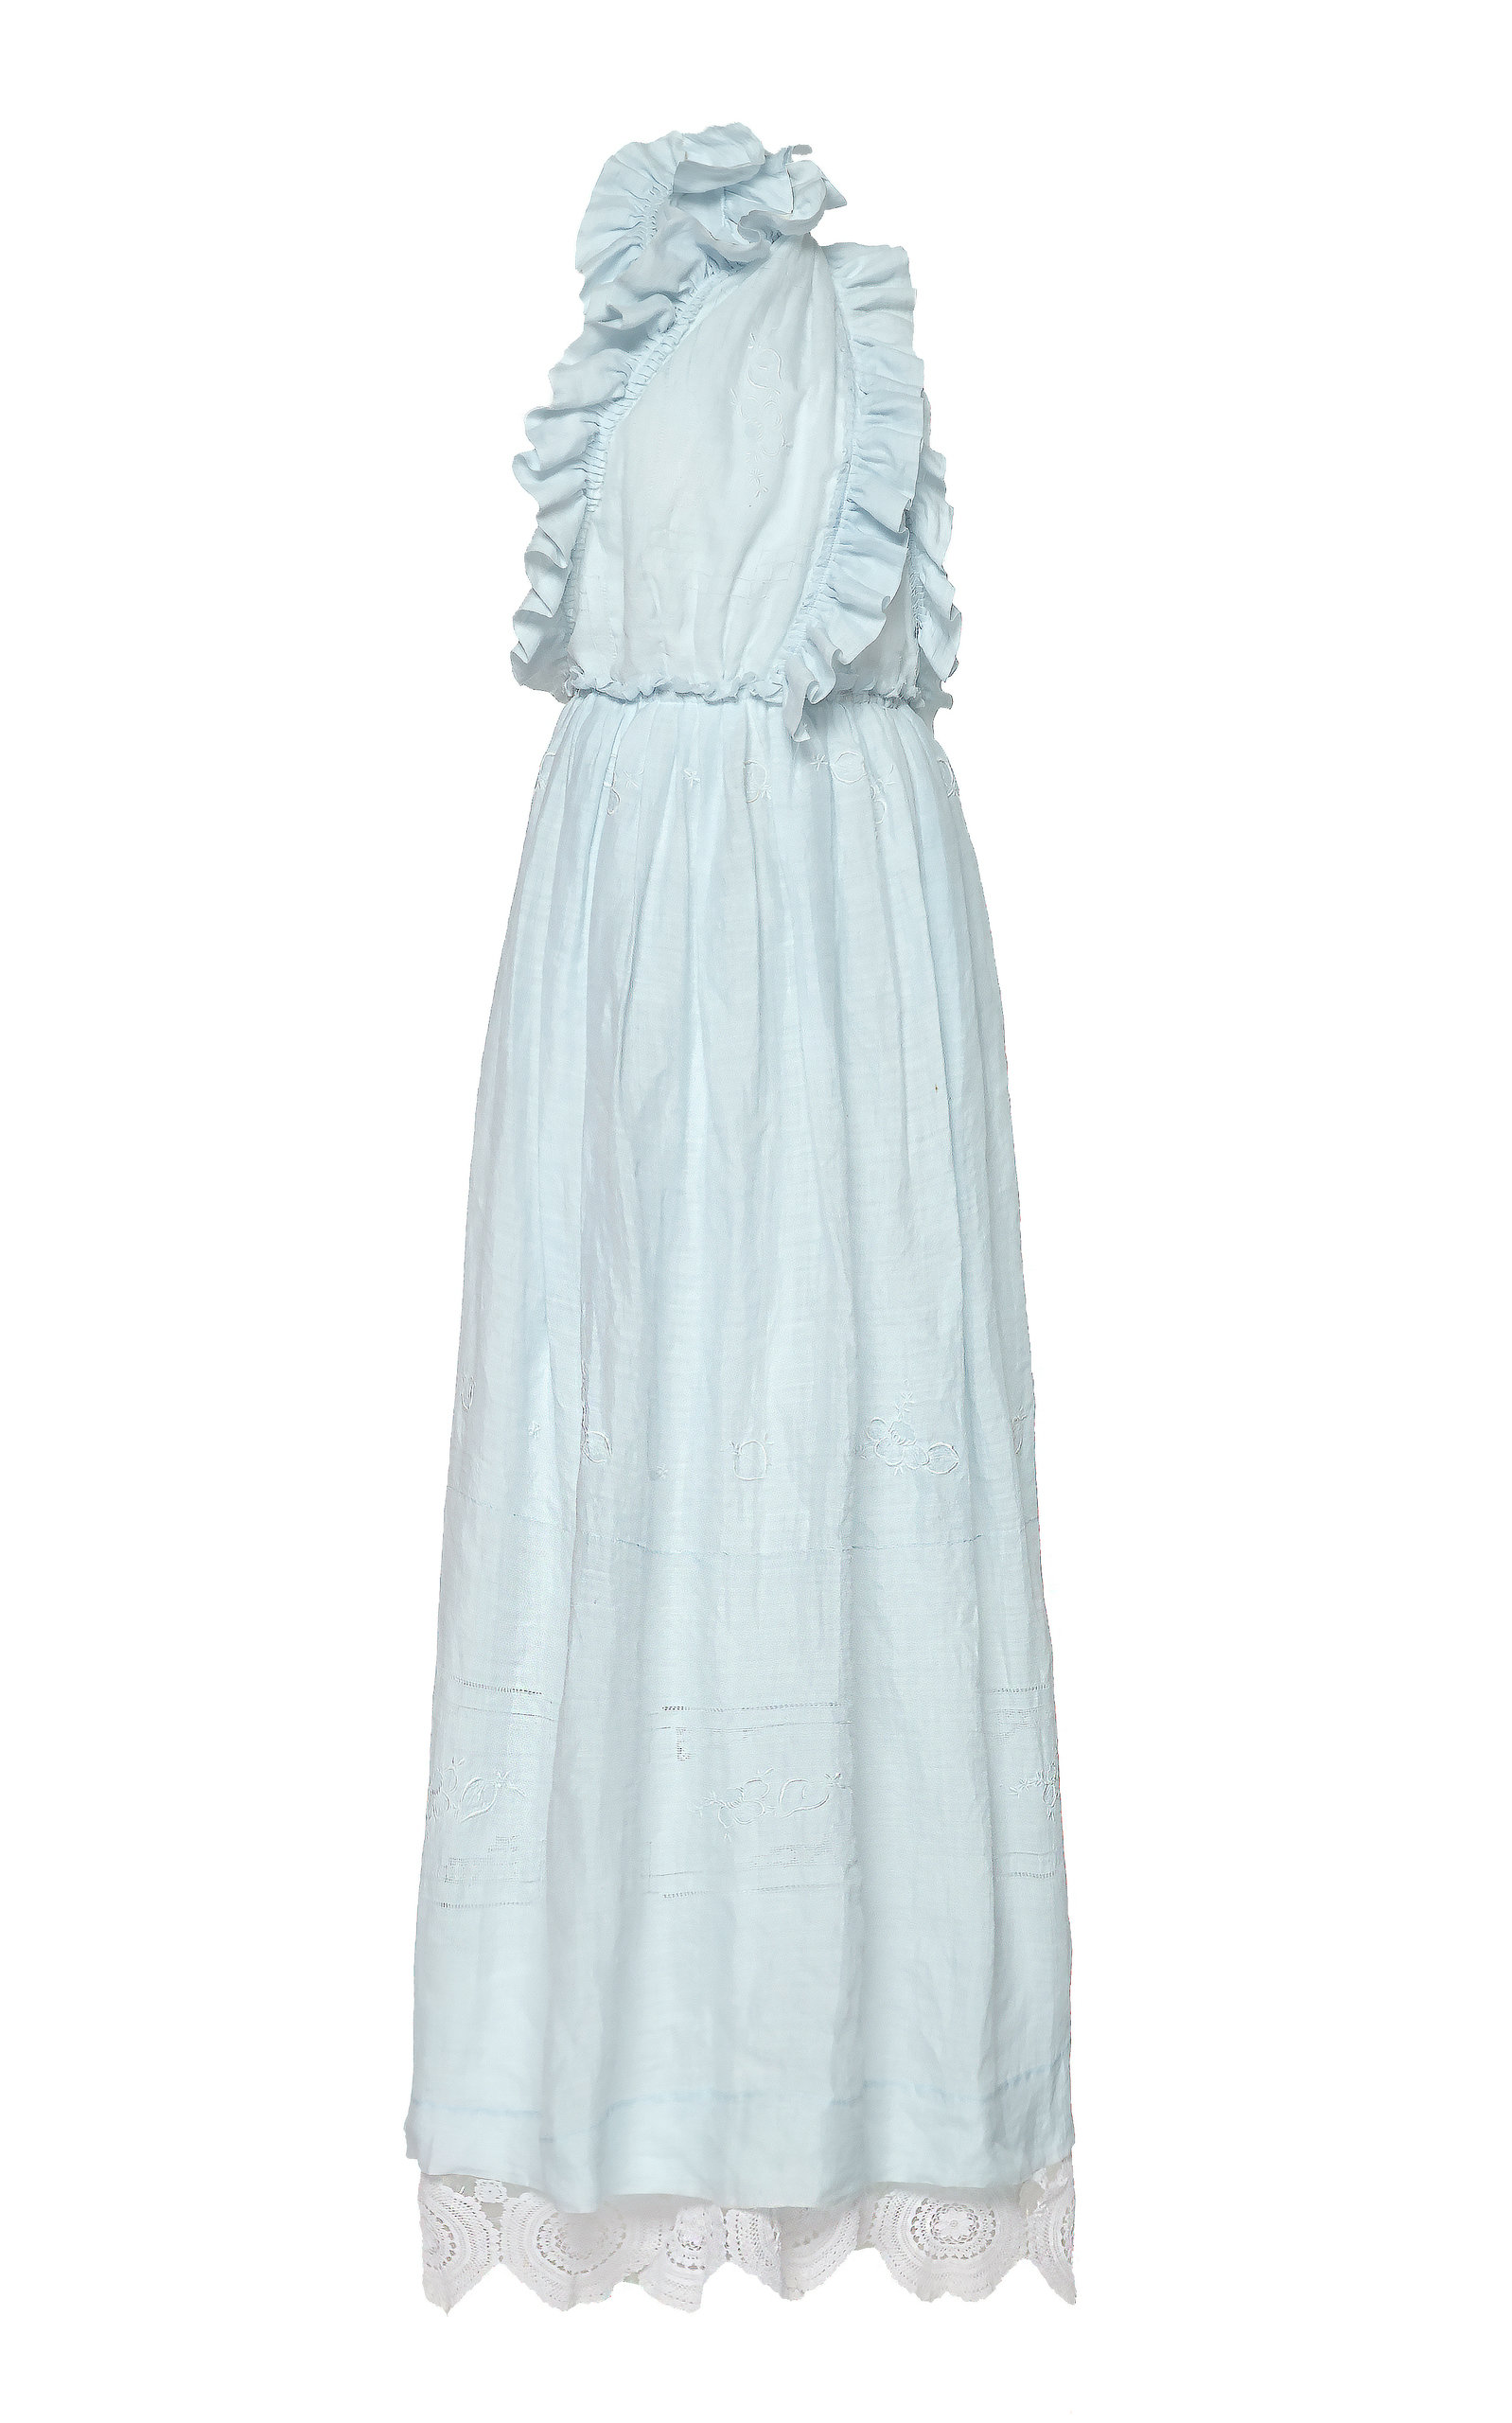 Buy nevenka Loyalty Halter Ruffle-Trimmed Cotton-Voile Dress online, shop nevenka at the best price